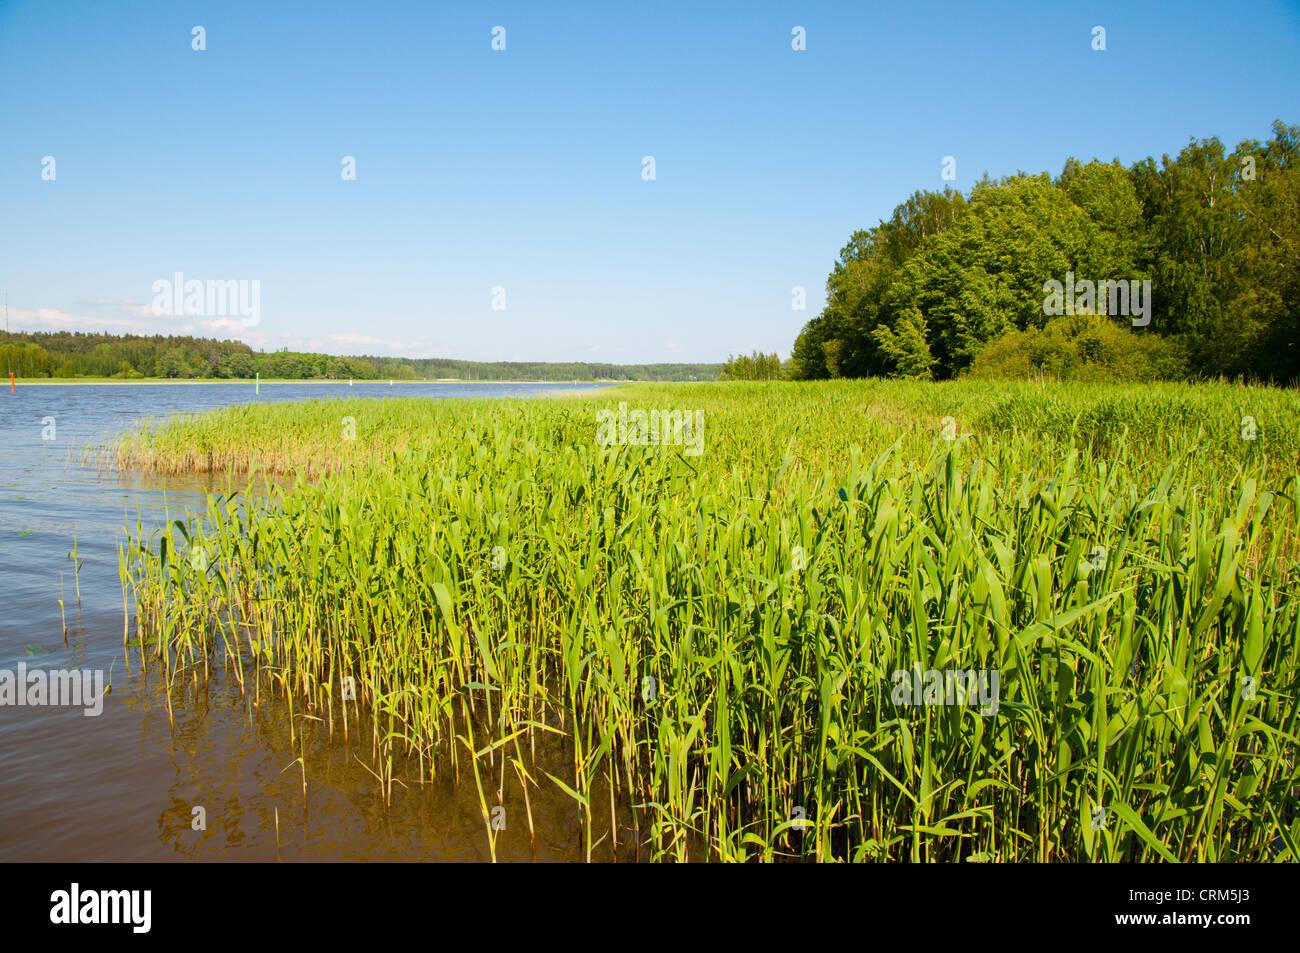 Porvoonjoki river Porvoo Uusimaa province Finland northern Europe - Stock Image